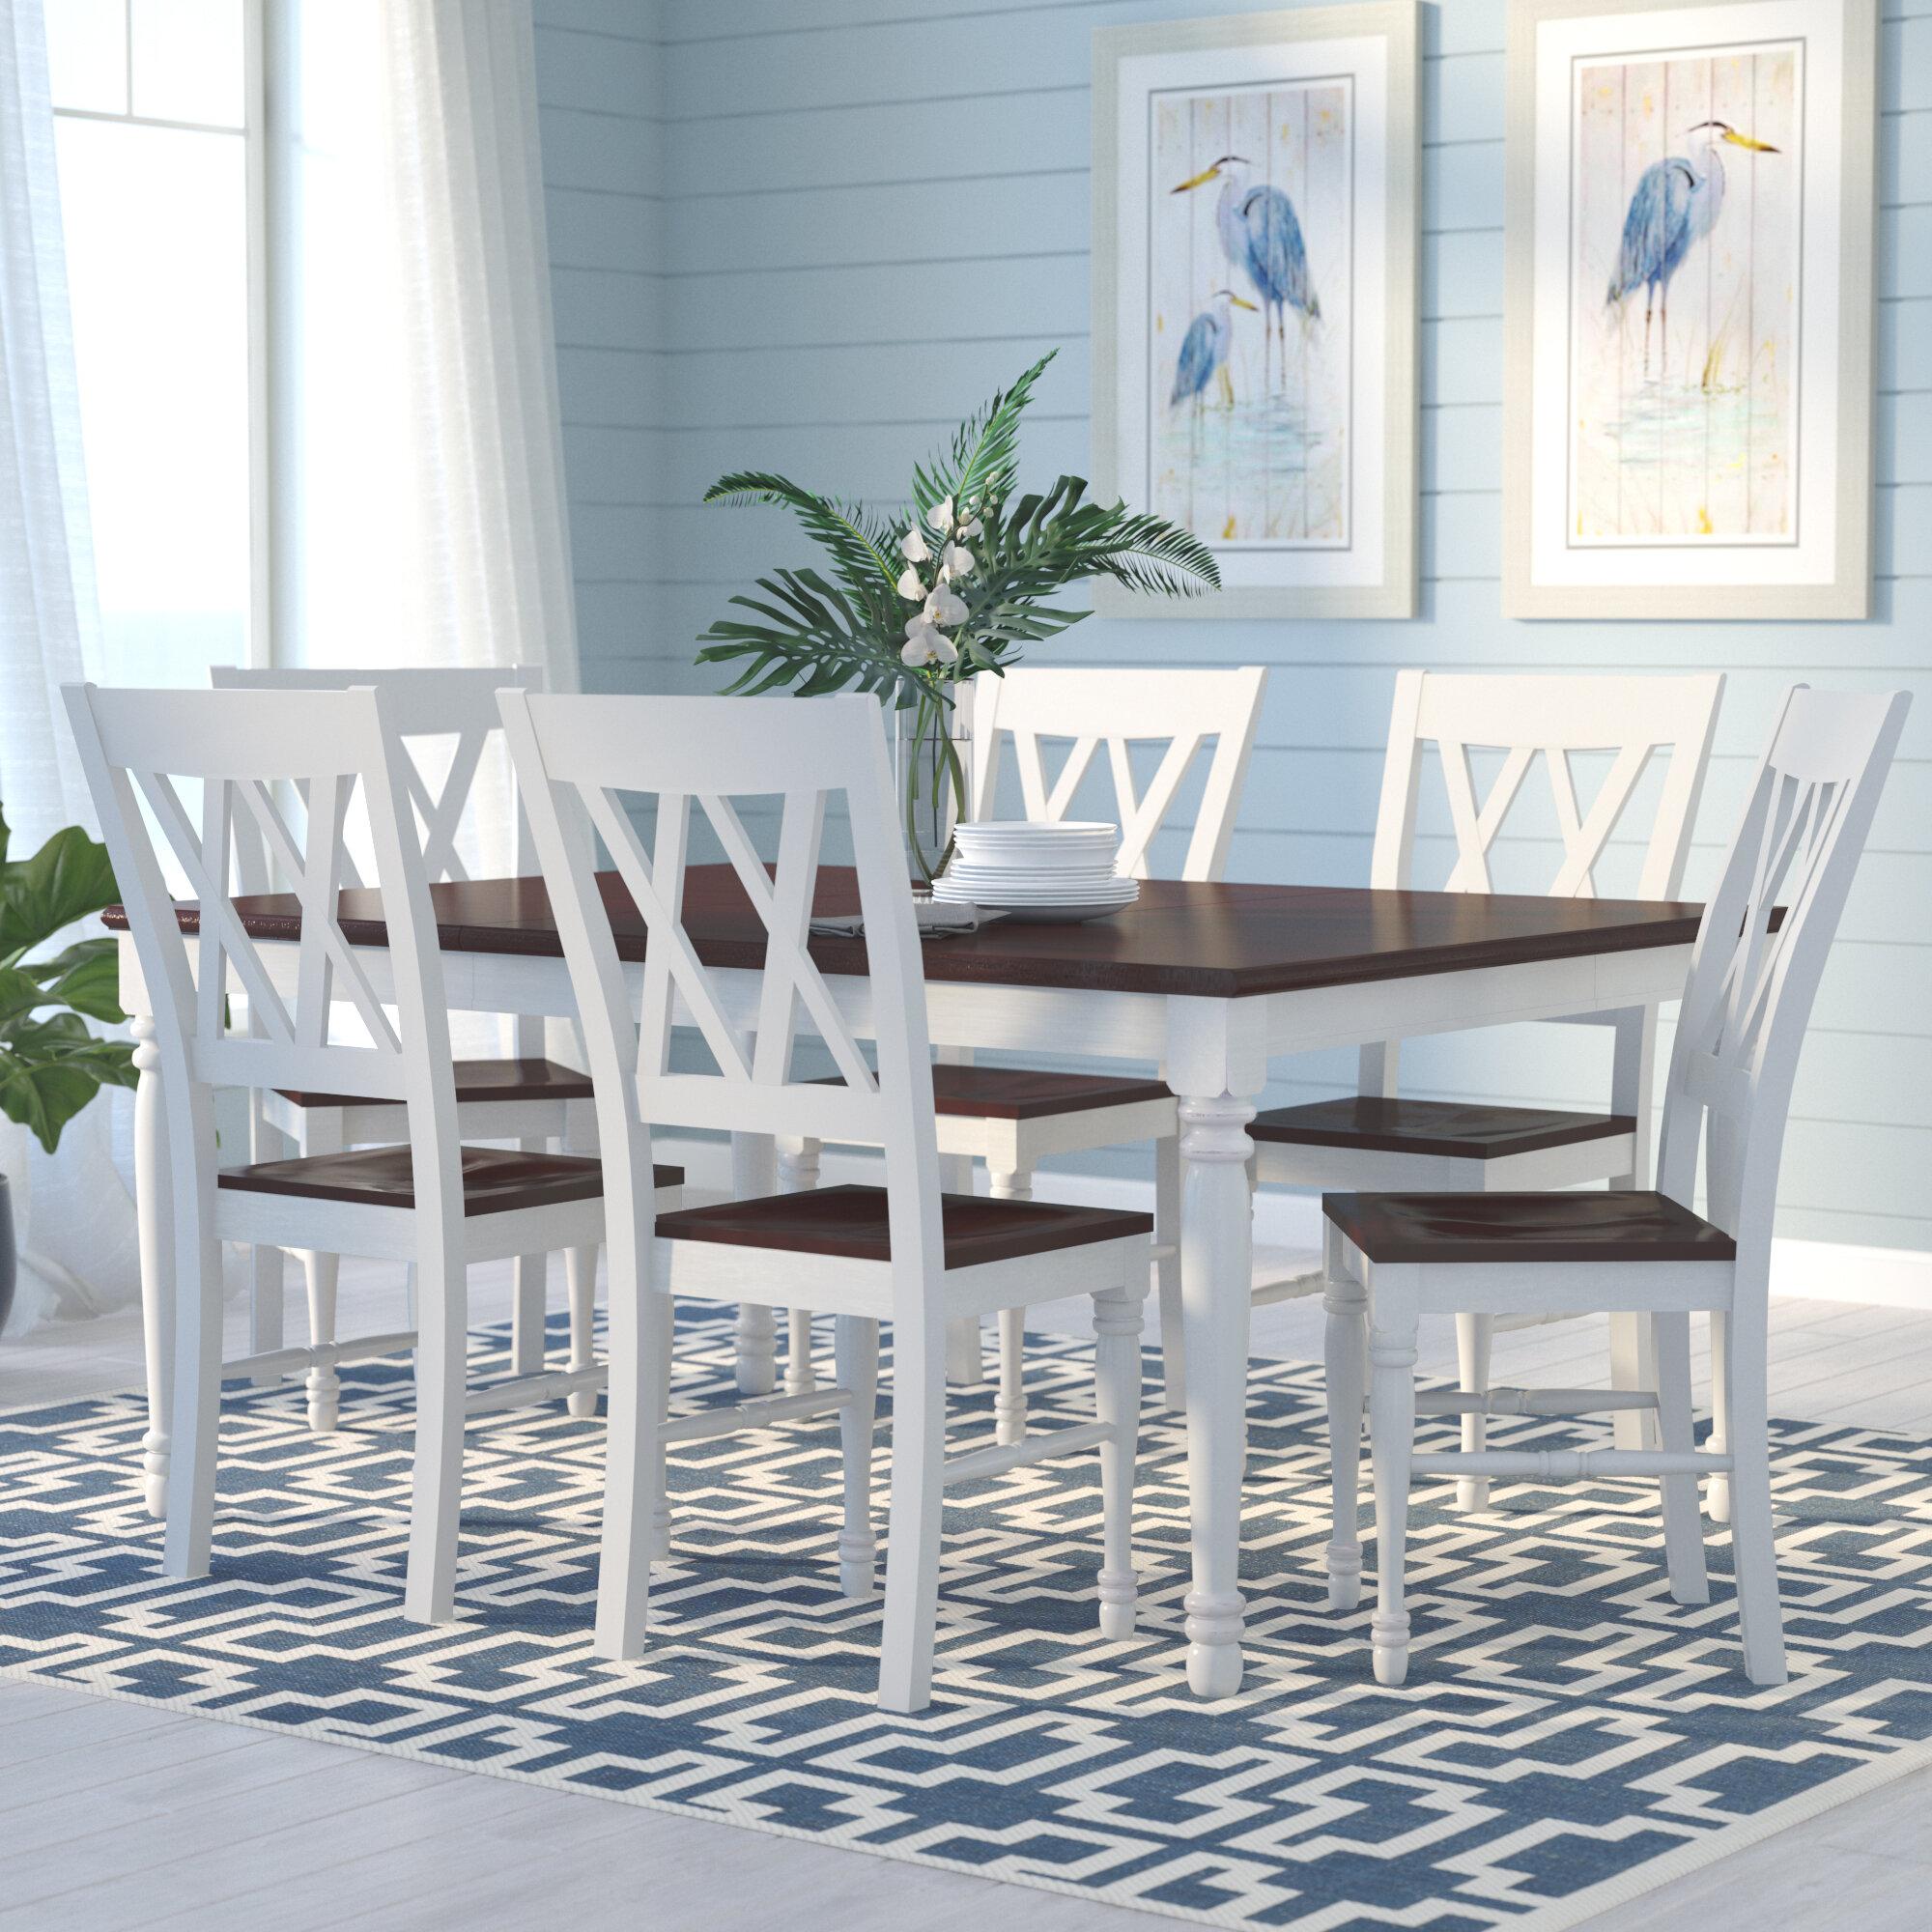 Banquette Dining Set | Wayfair